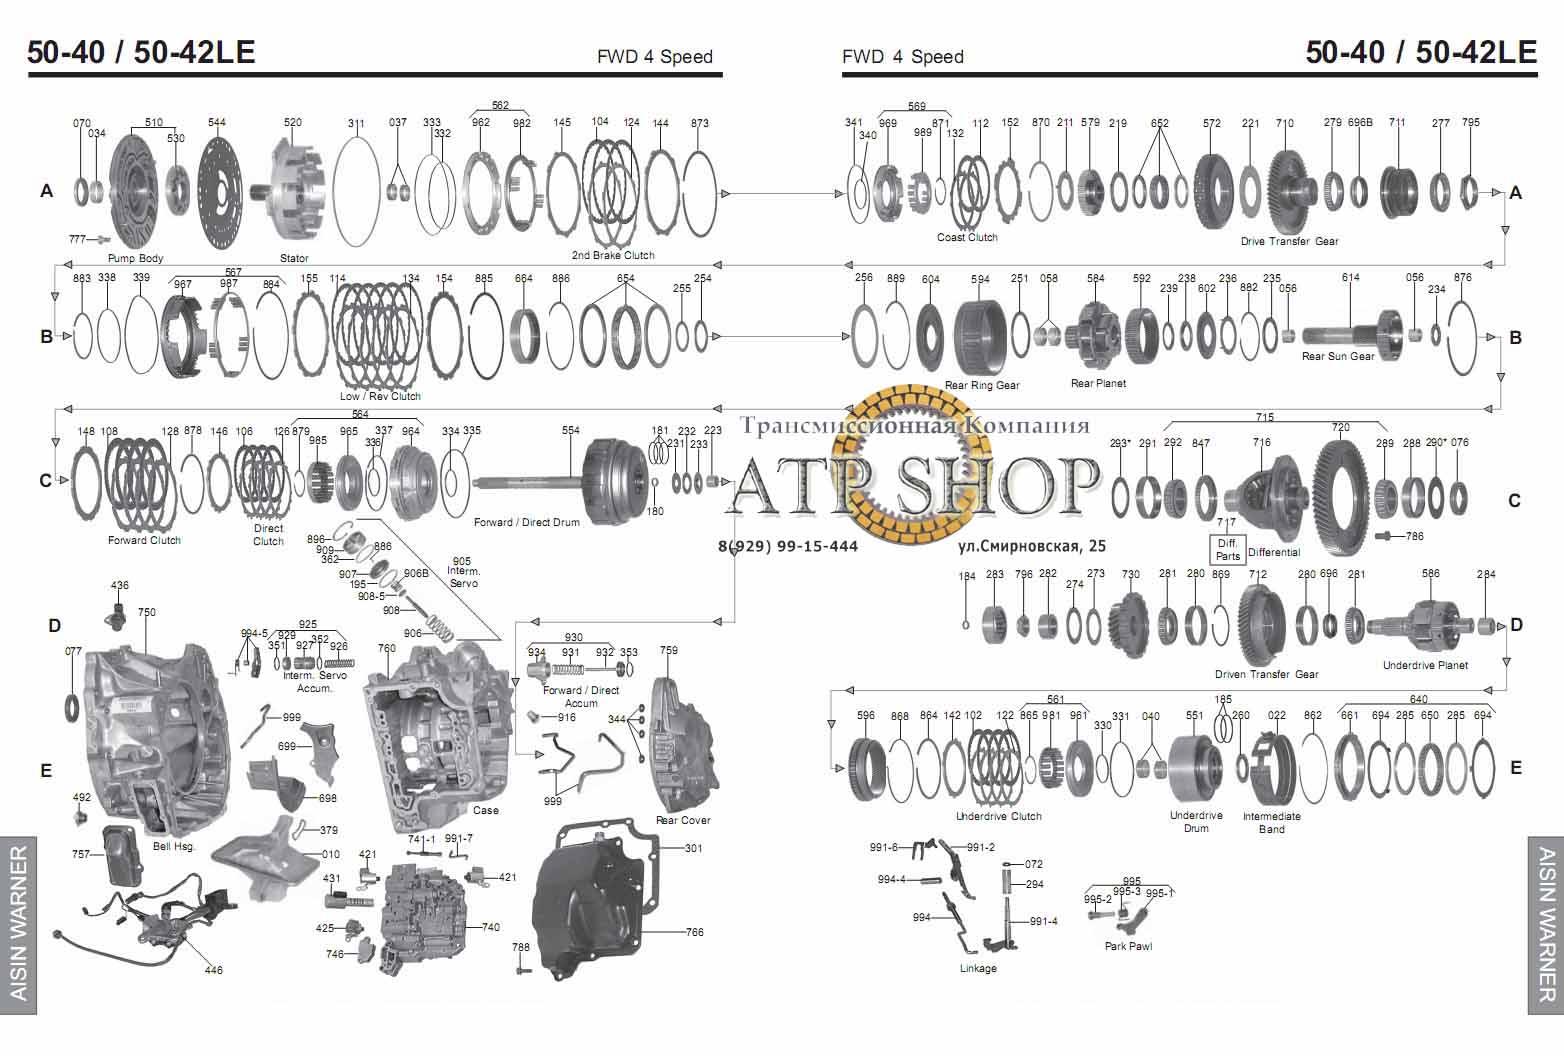 30-40le transmission manual